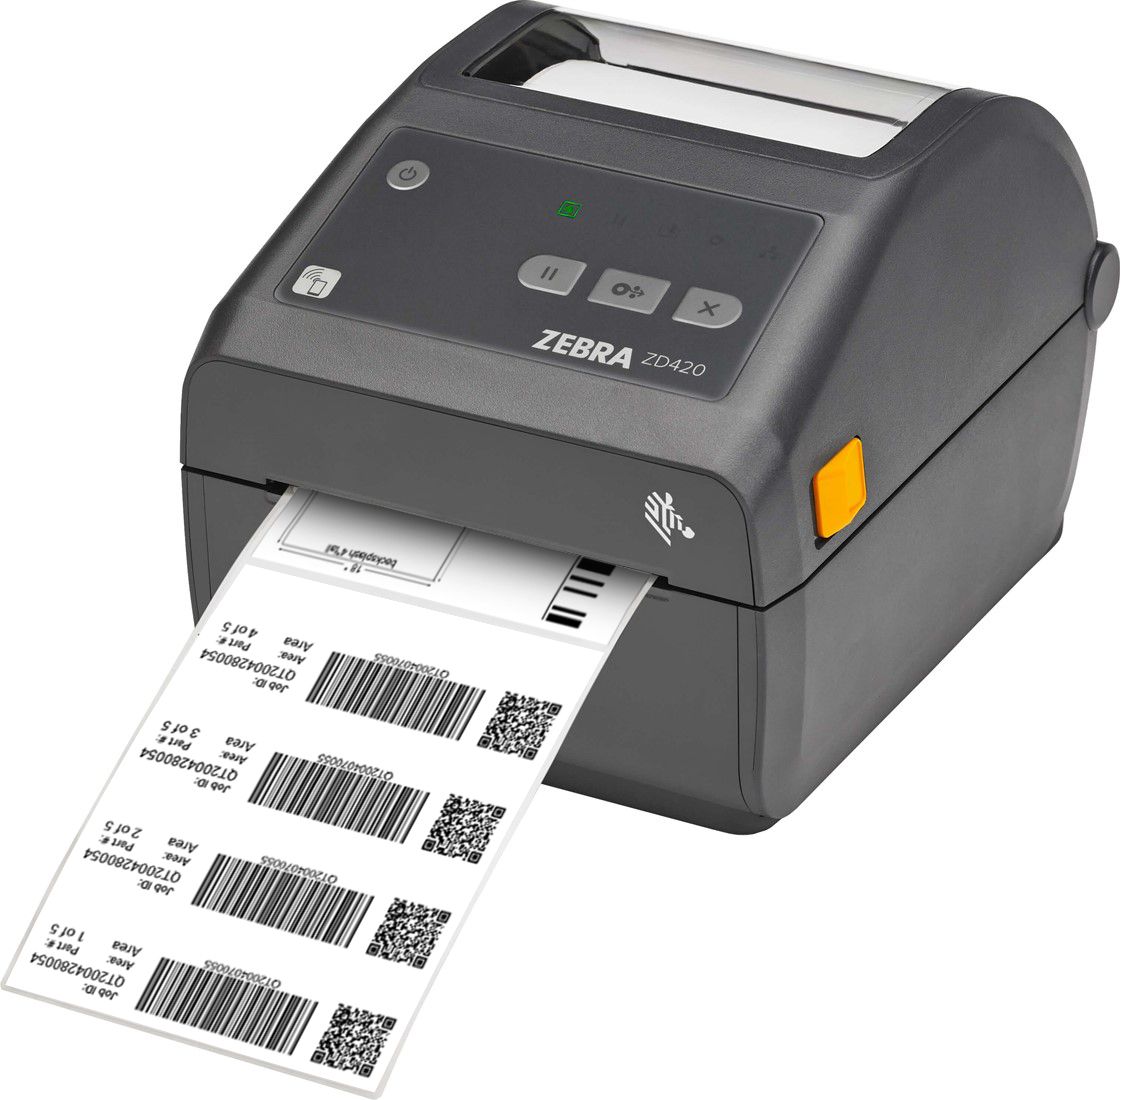 Label for Countertops Fabricators